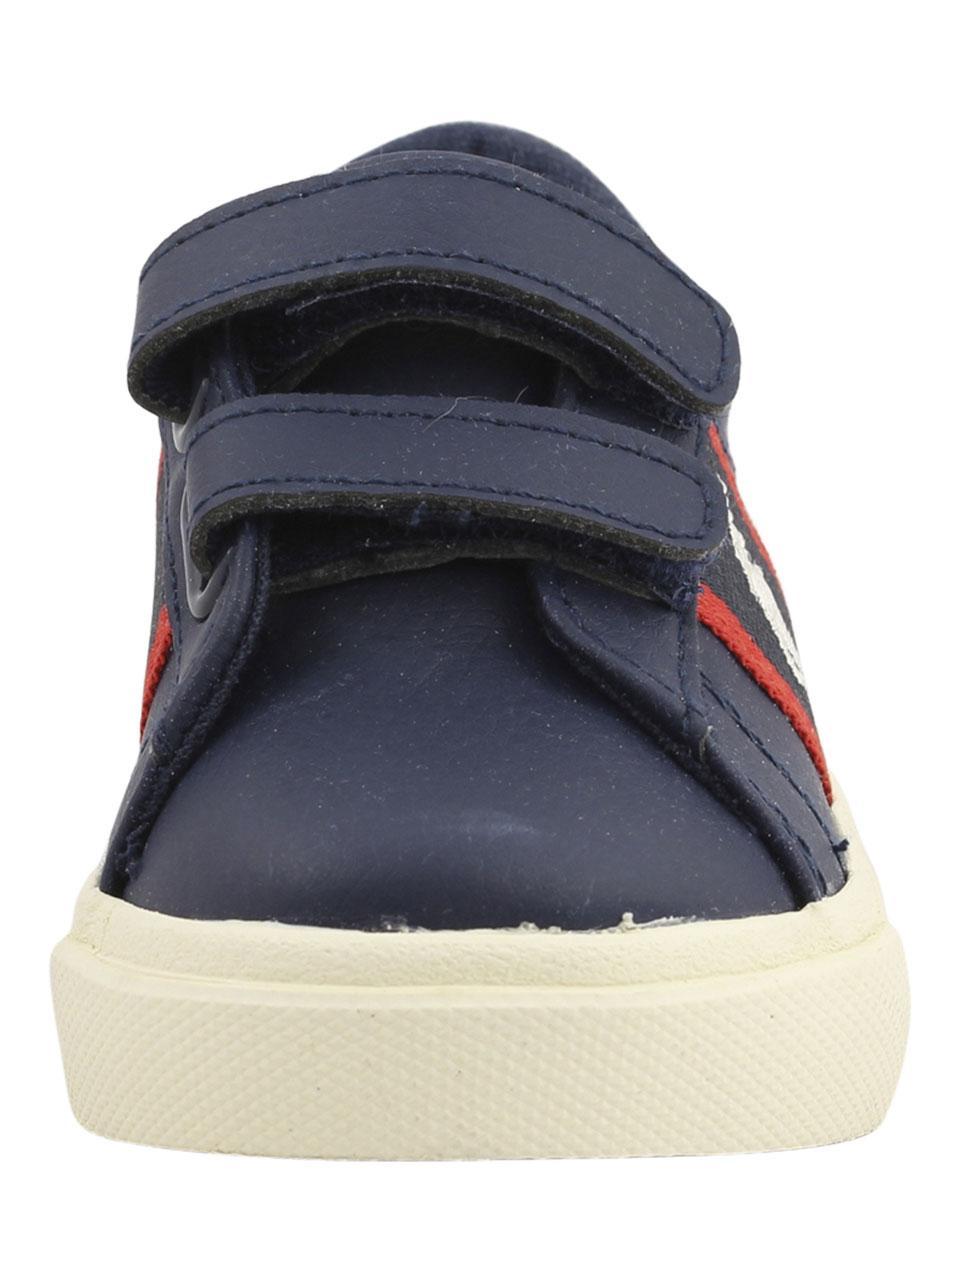 6673cc92096f5 Polo Ralph Lauren Toddler Boy's Geoff-EZ Sneakers Shoes by Polo Ralph Lauren